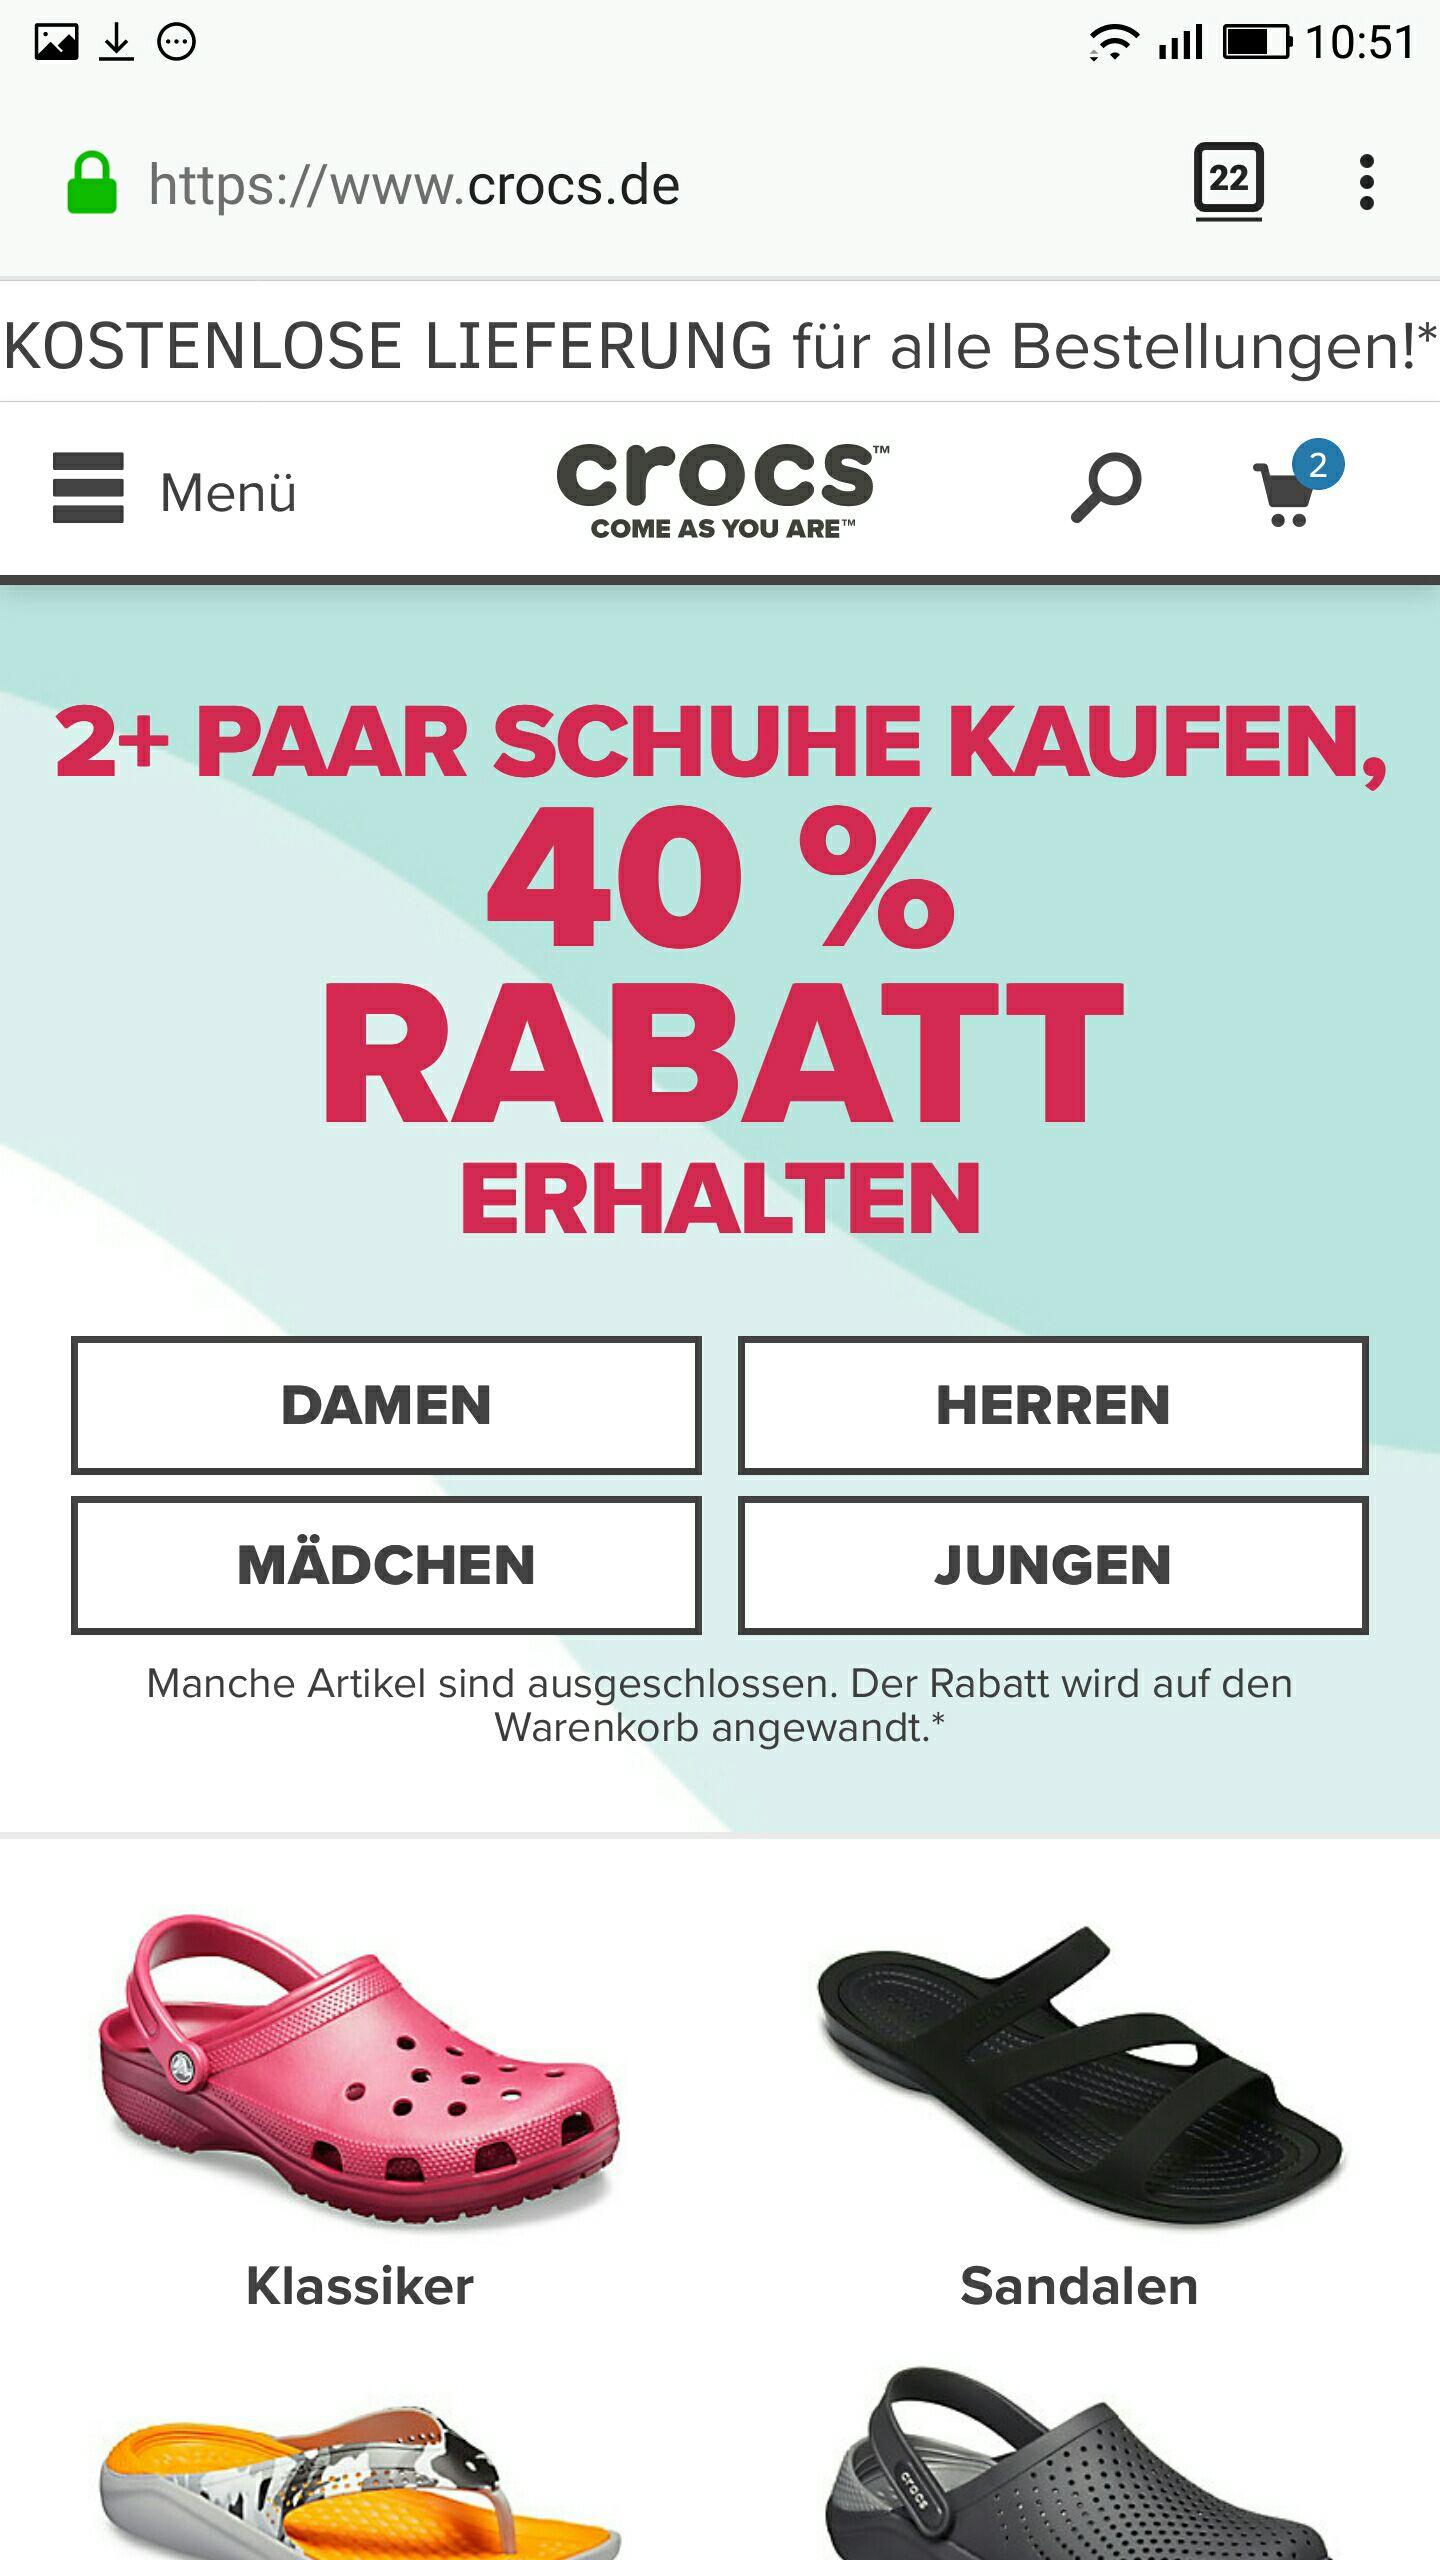 Crocs - 40% Rabatt ab 2 Paar Schuhen versandkostenfrei